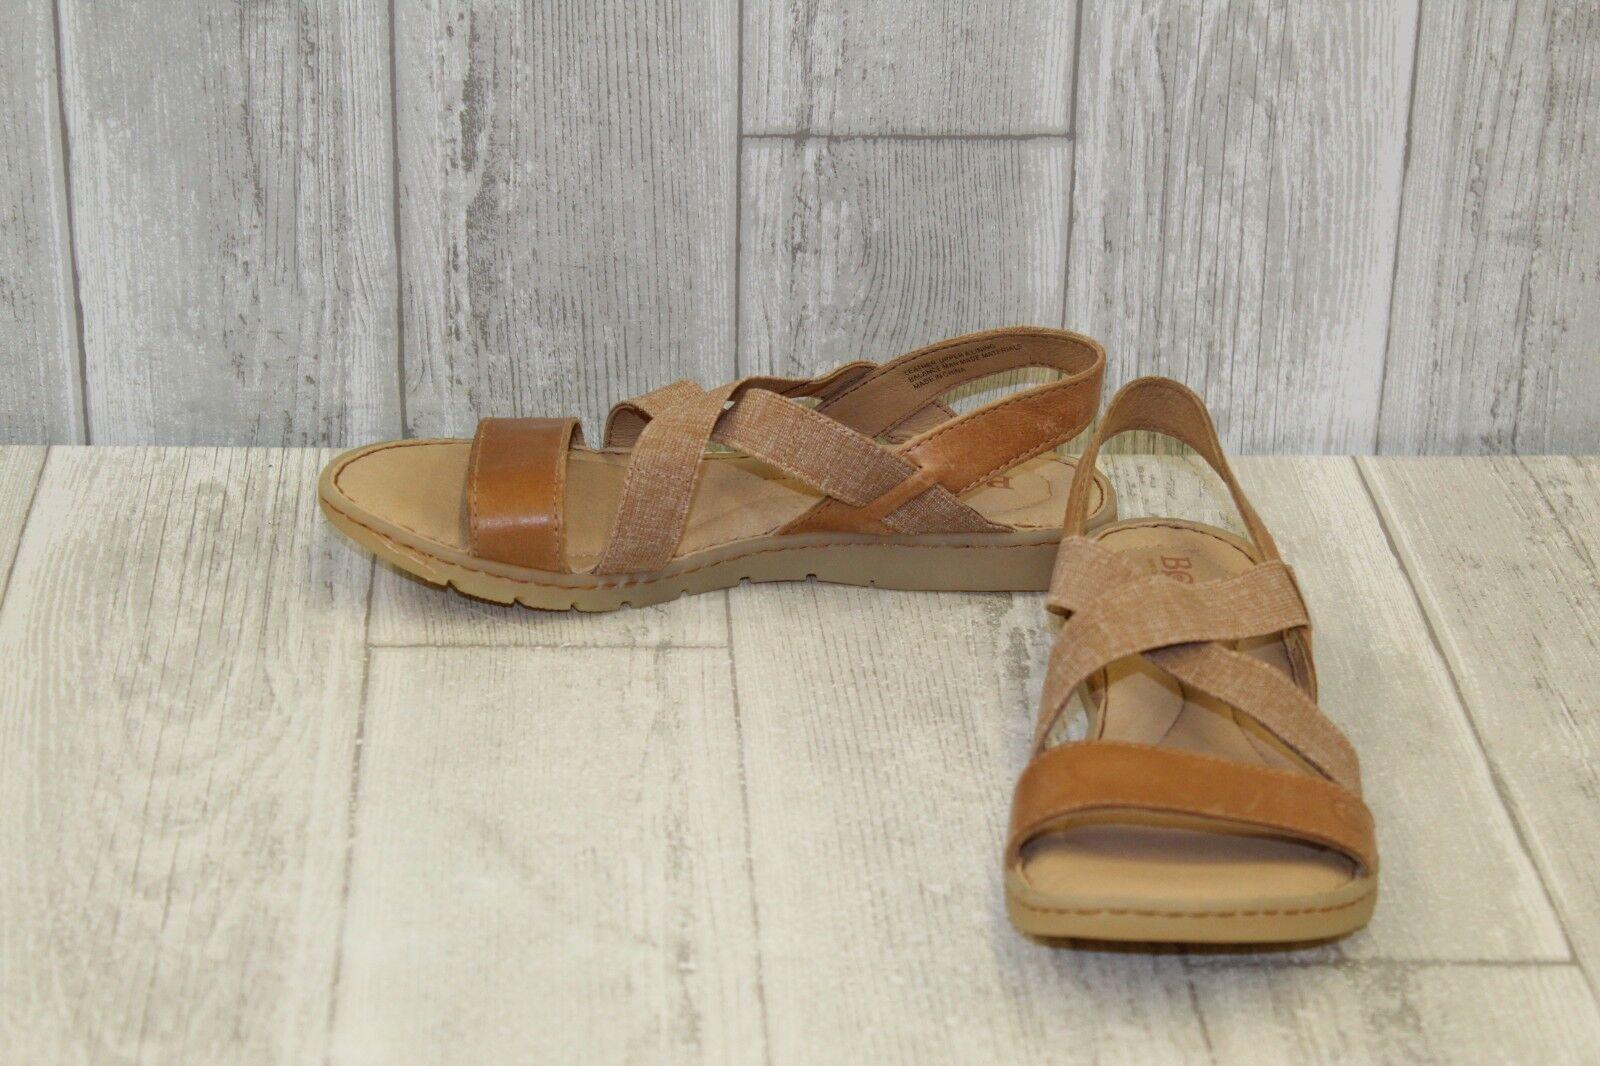 Born Atiana Sandals - Women's Size 6 M - Light Brown